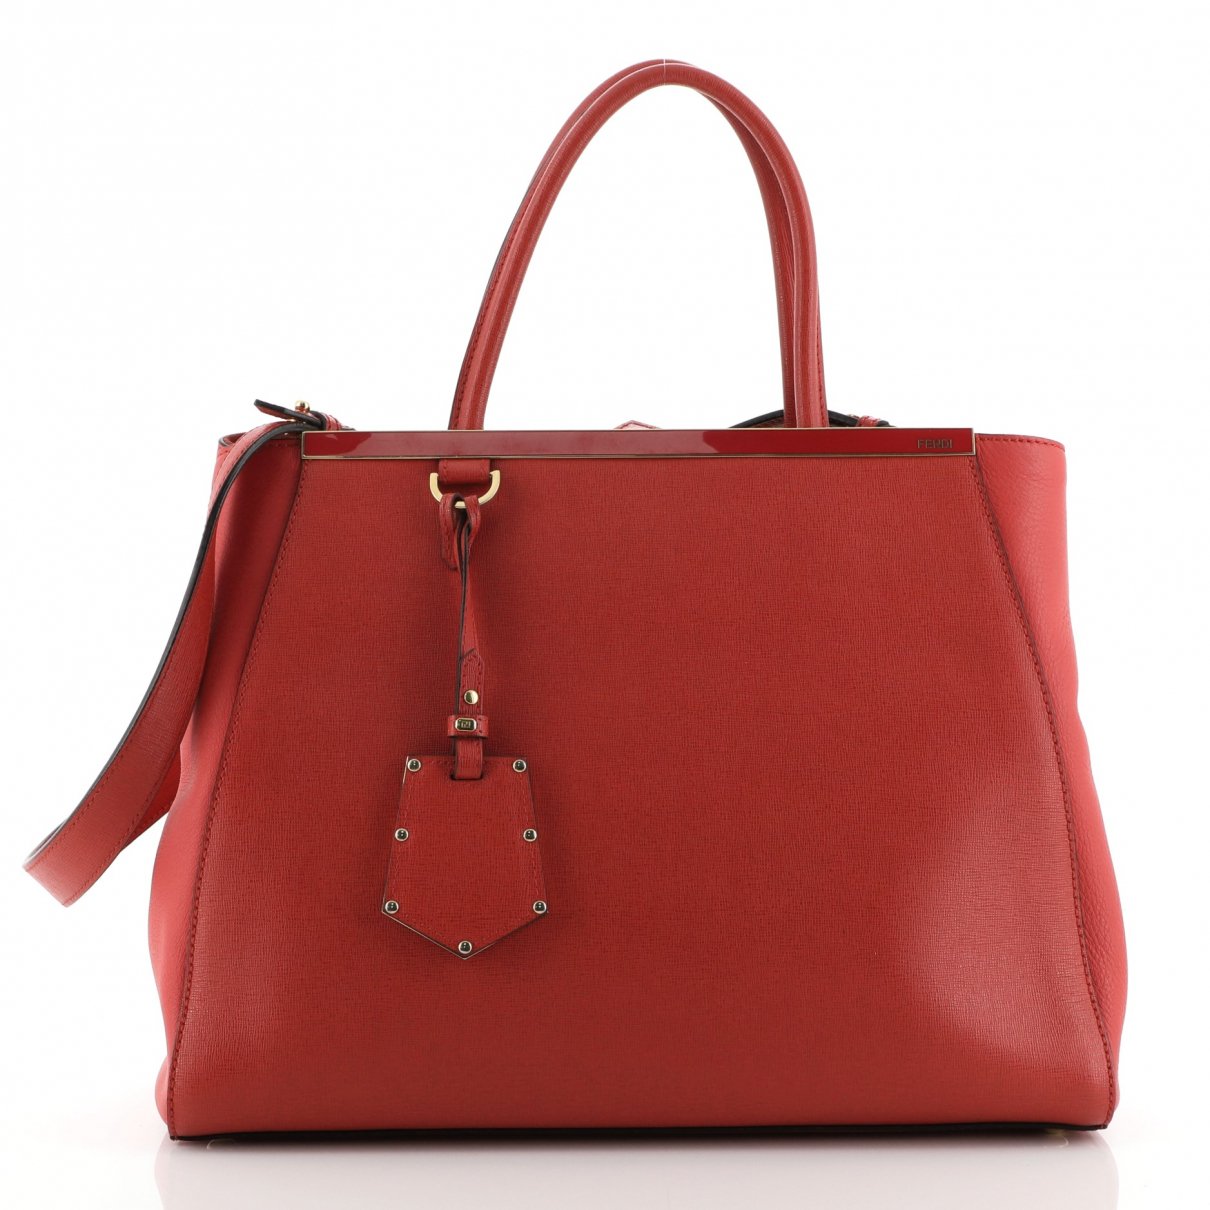 Fendi \N Handtasche in  Rot Leder